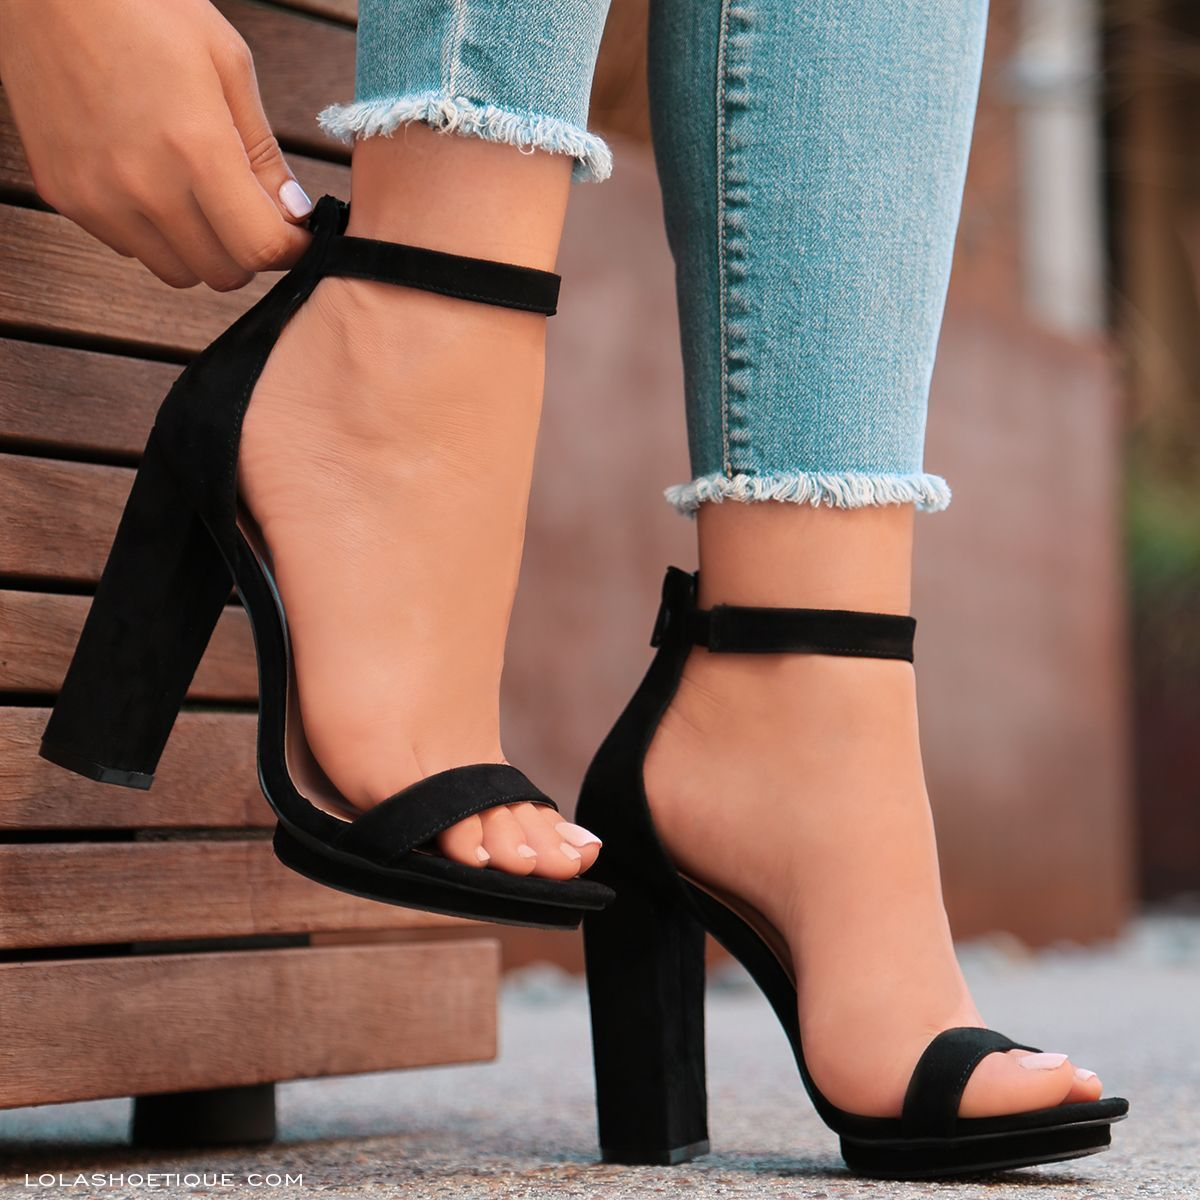 Women shoes Casual Wedges - #WomenshoesWedgesStilettos - #WomenshoesSneakersChea...